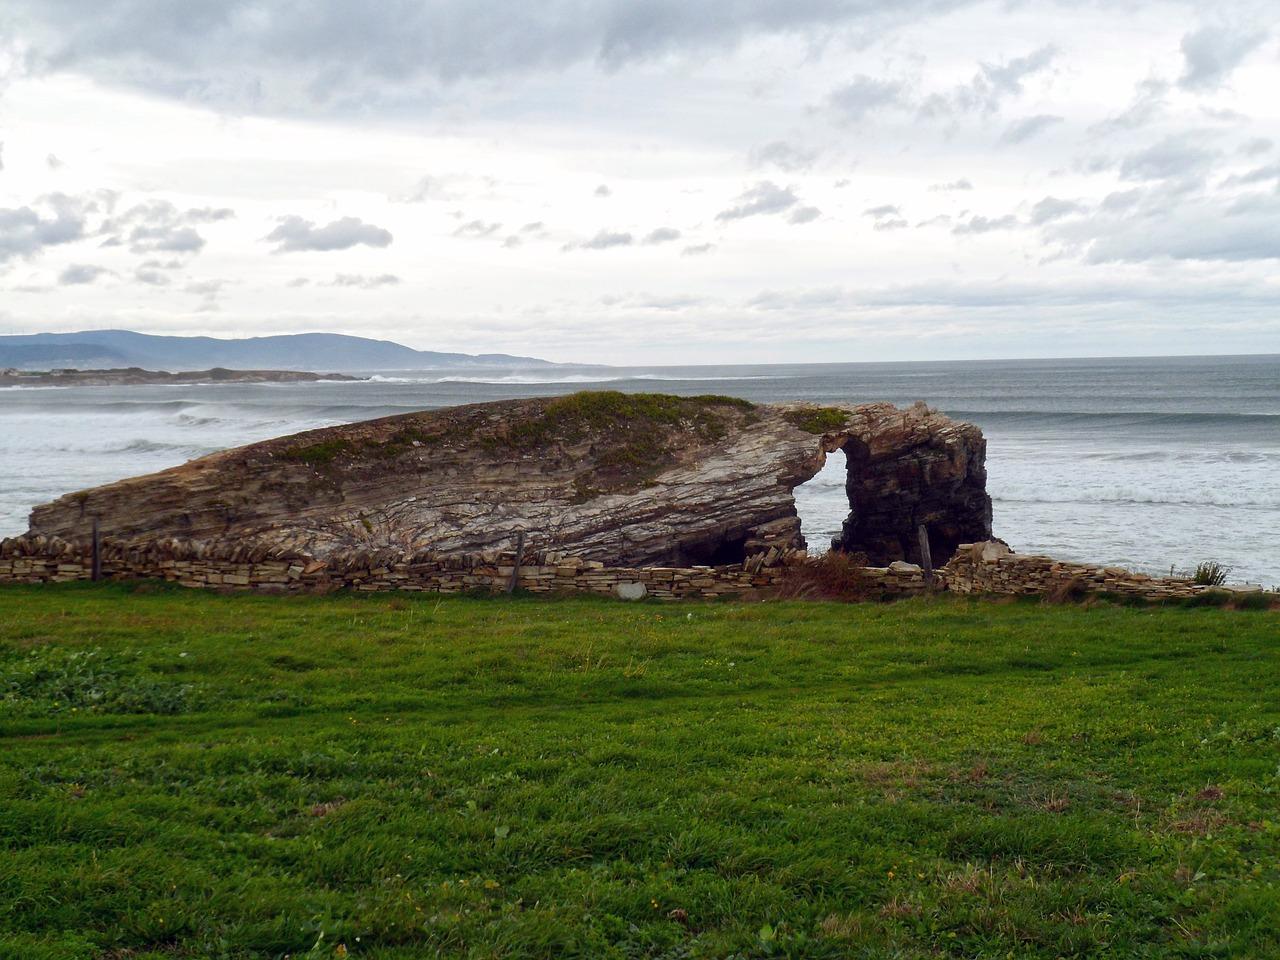 paisaje de costa atlántica